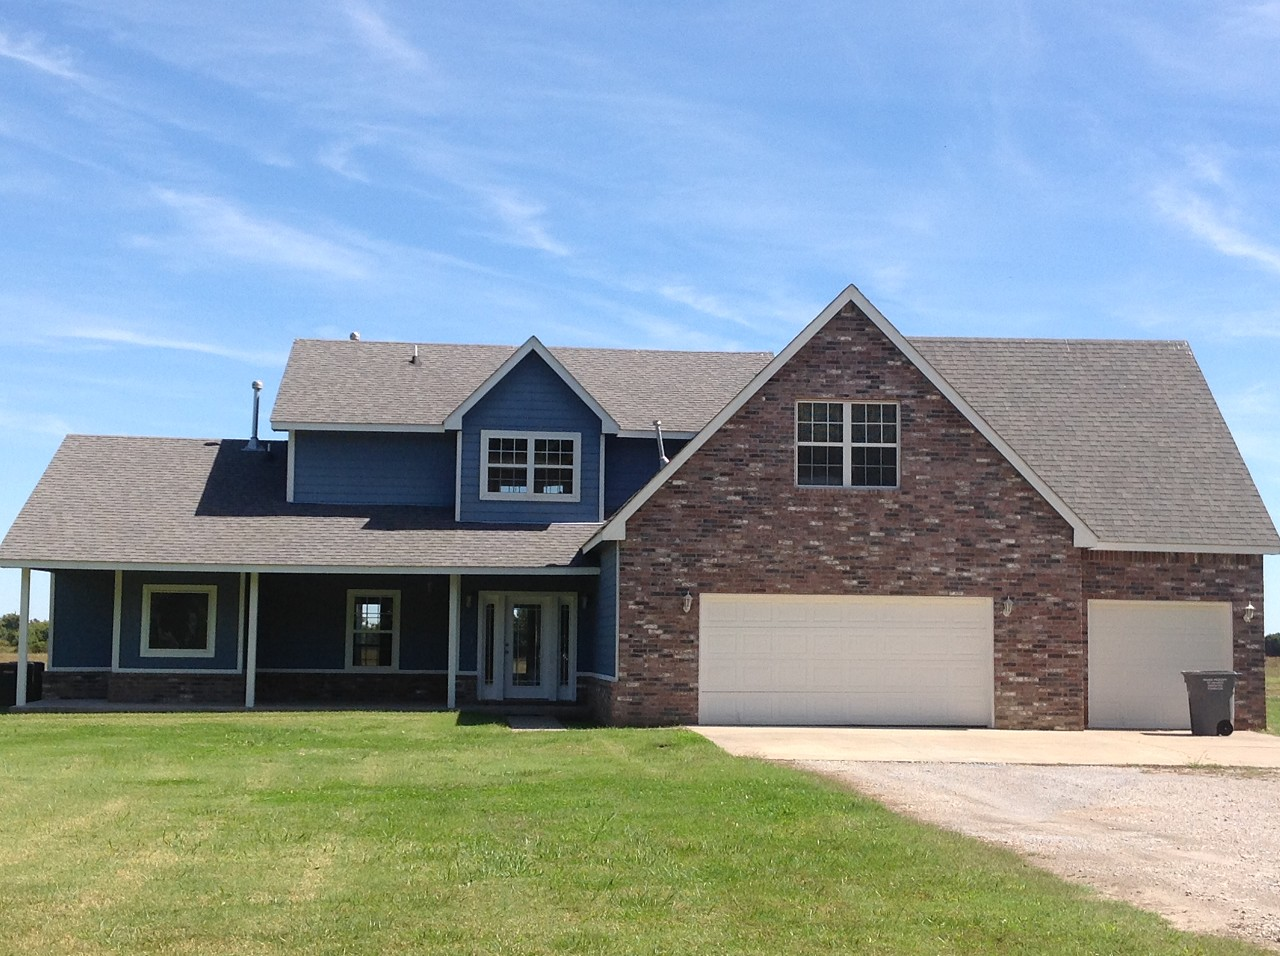 Real Estate for Sale, ListingId: 30018293, Haskell,OK74436